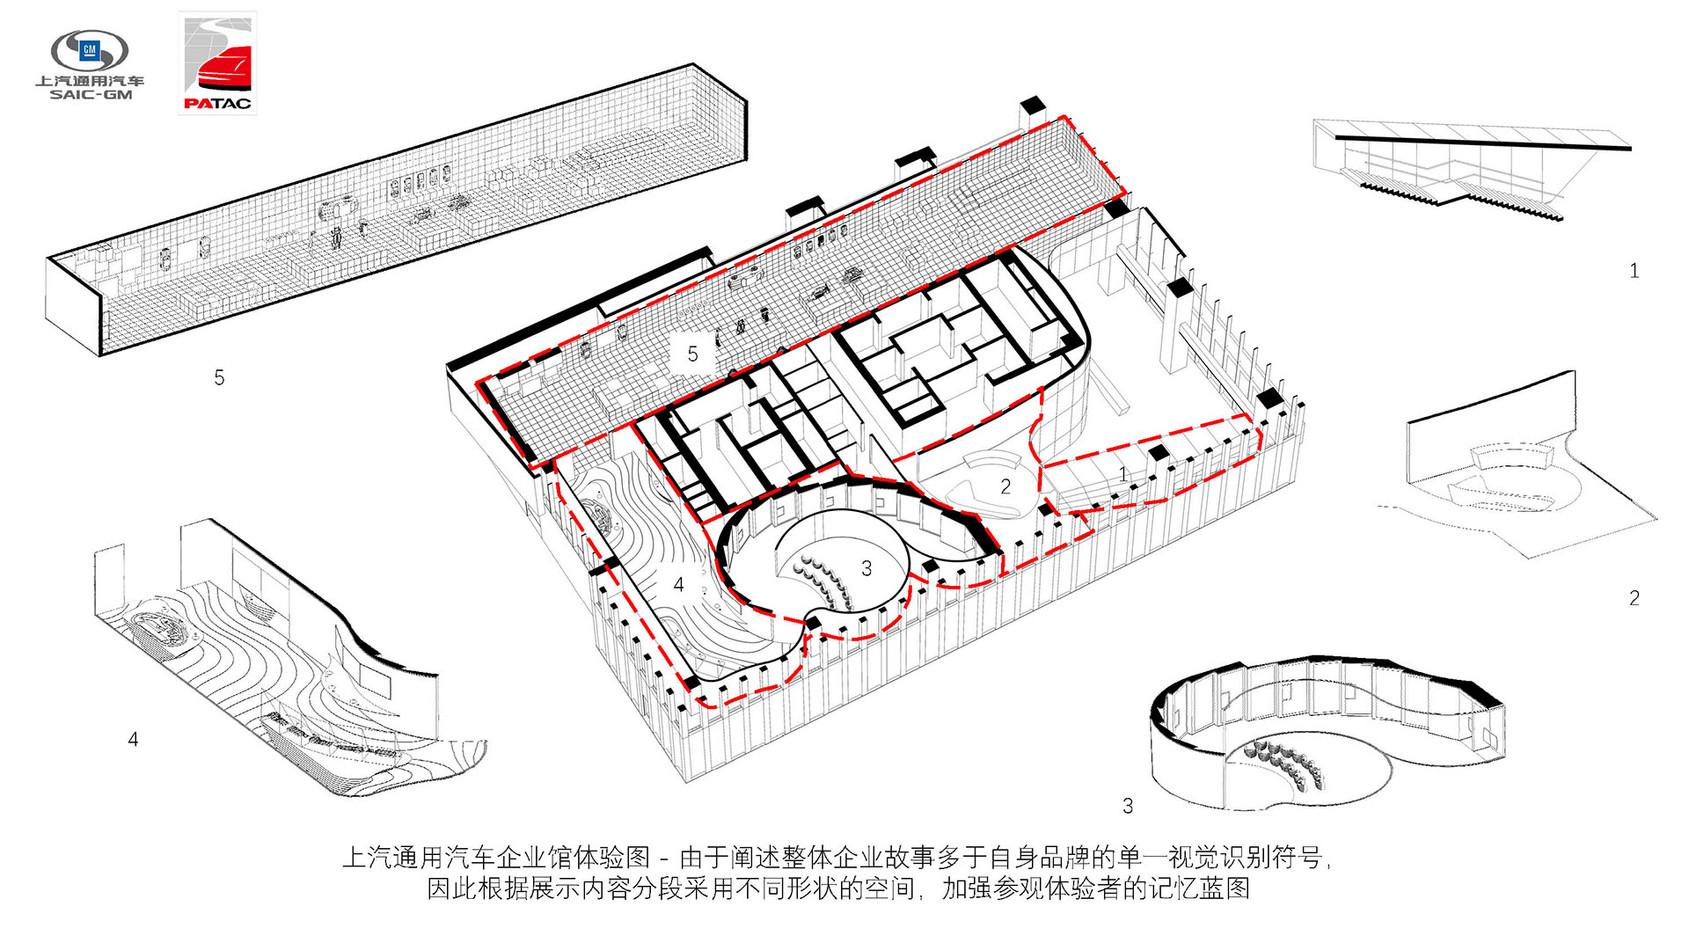 SGM-CORPORATE-MUSEUM-ZH 03.jpg